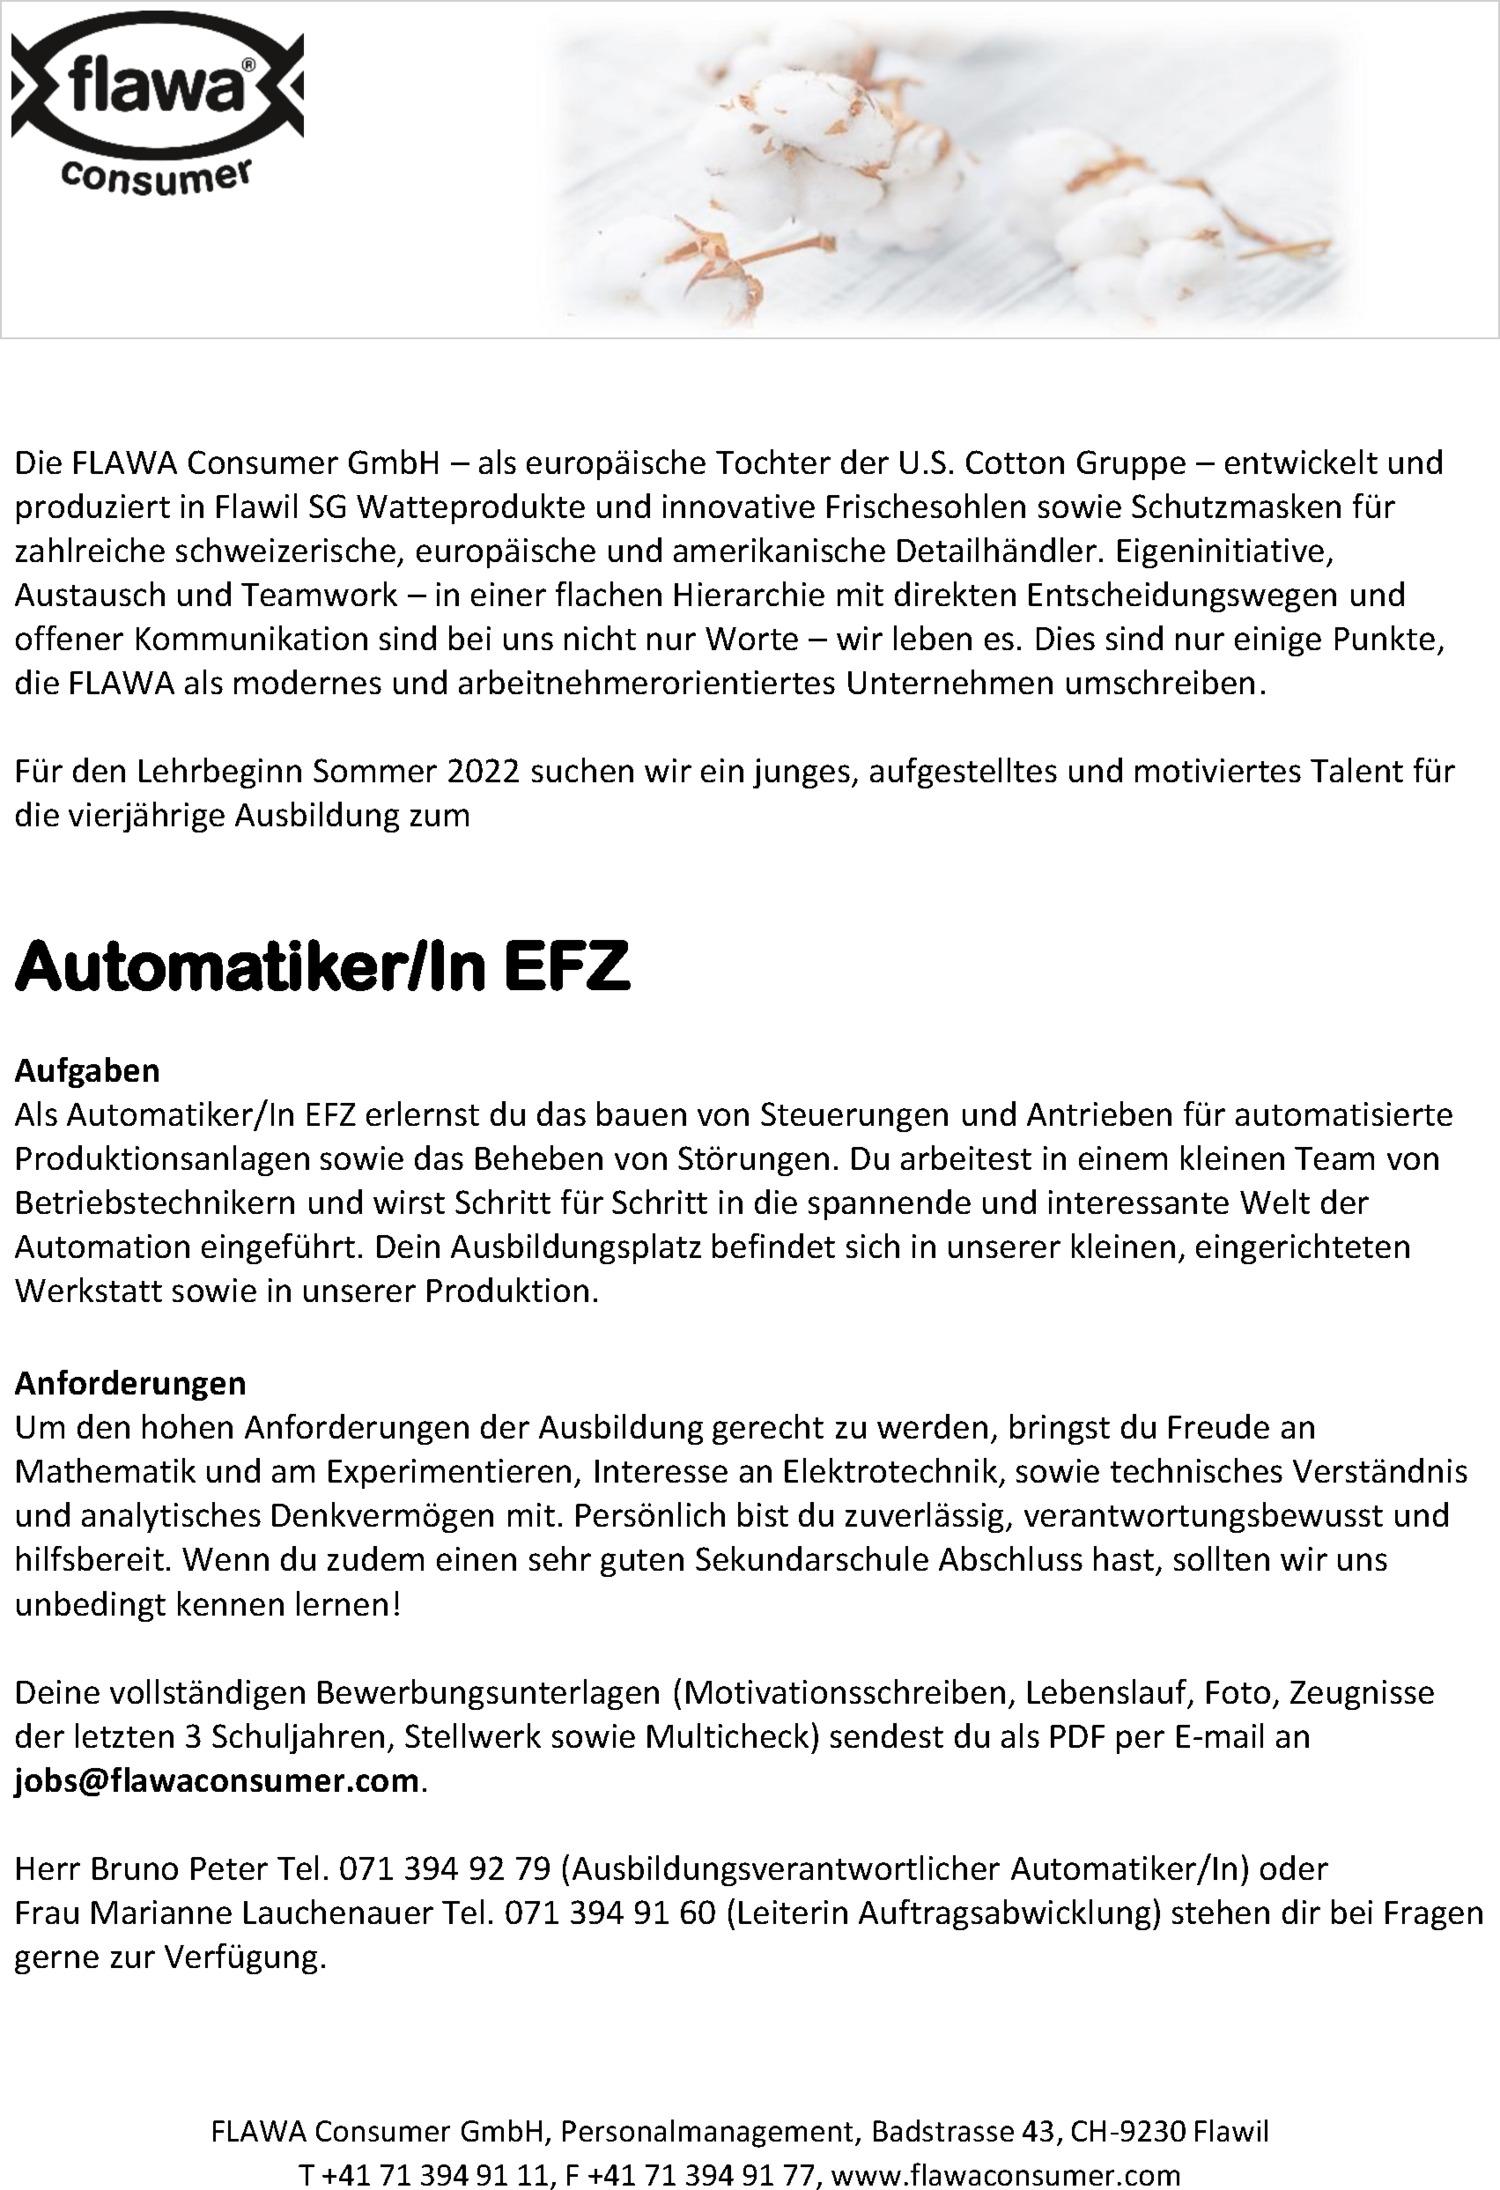 Inserat Automatiker/In EFZ